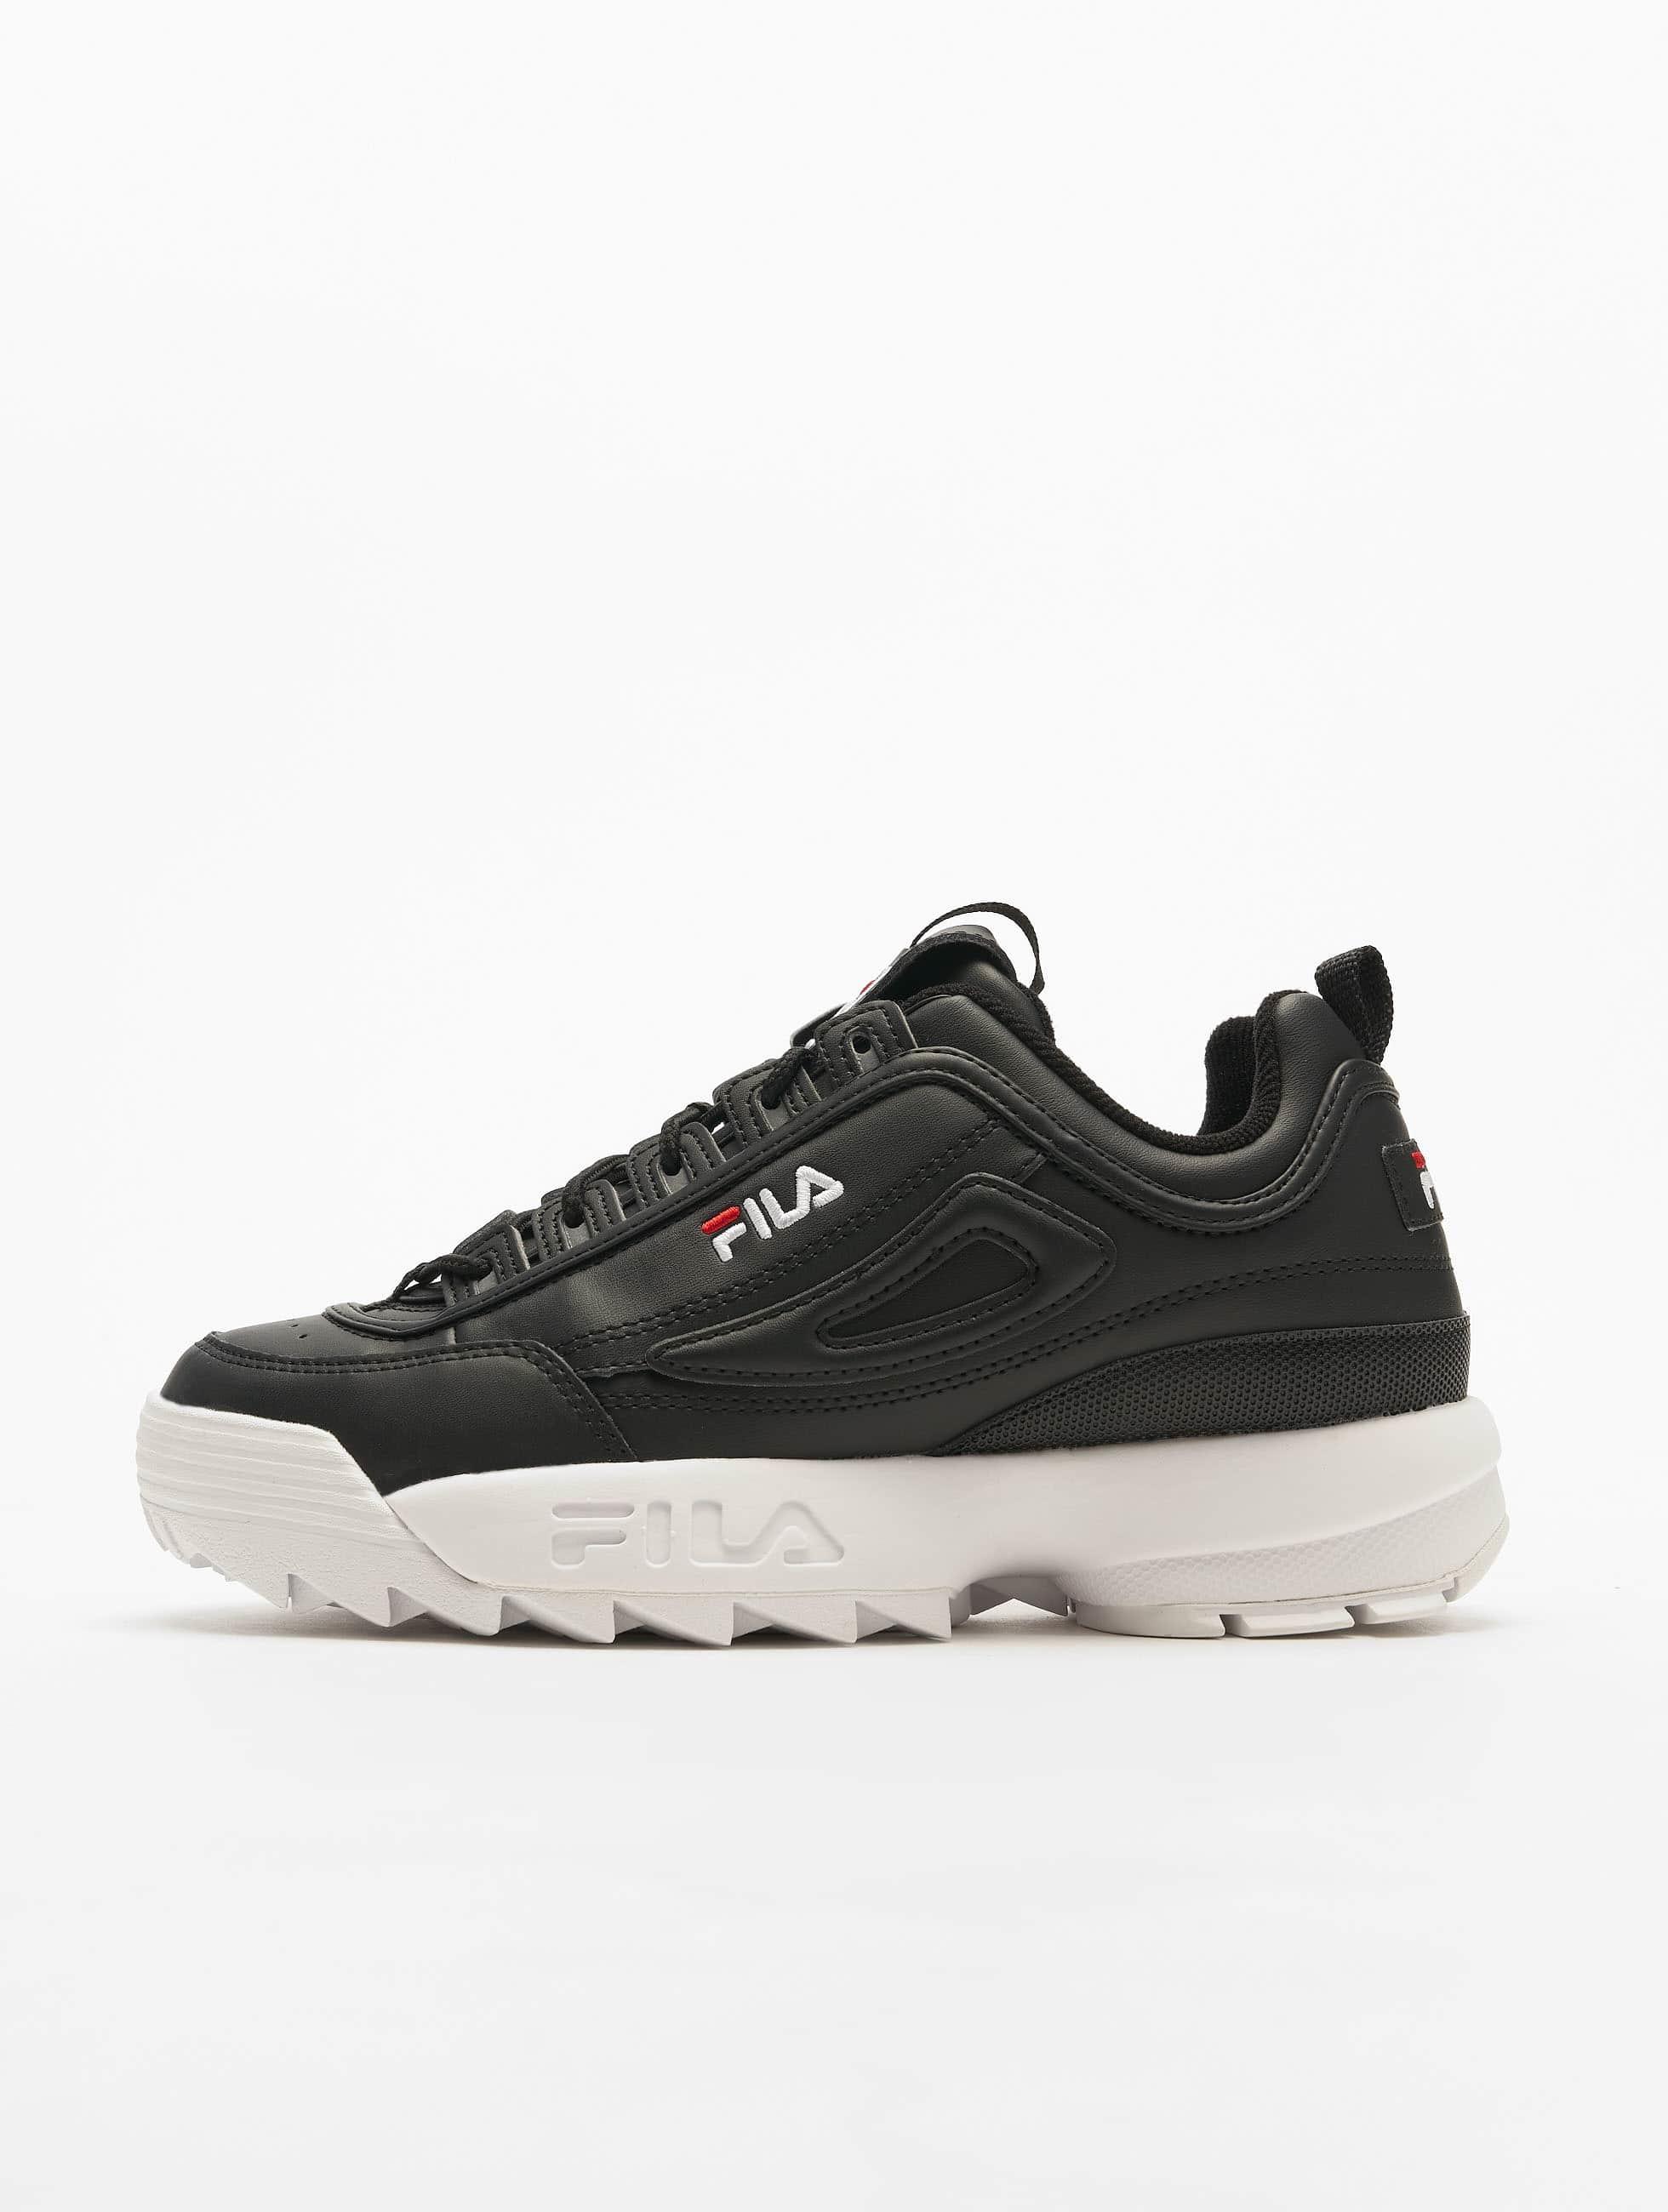 Fila Disruptor Low Sneakers Black